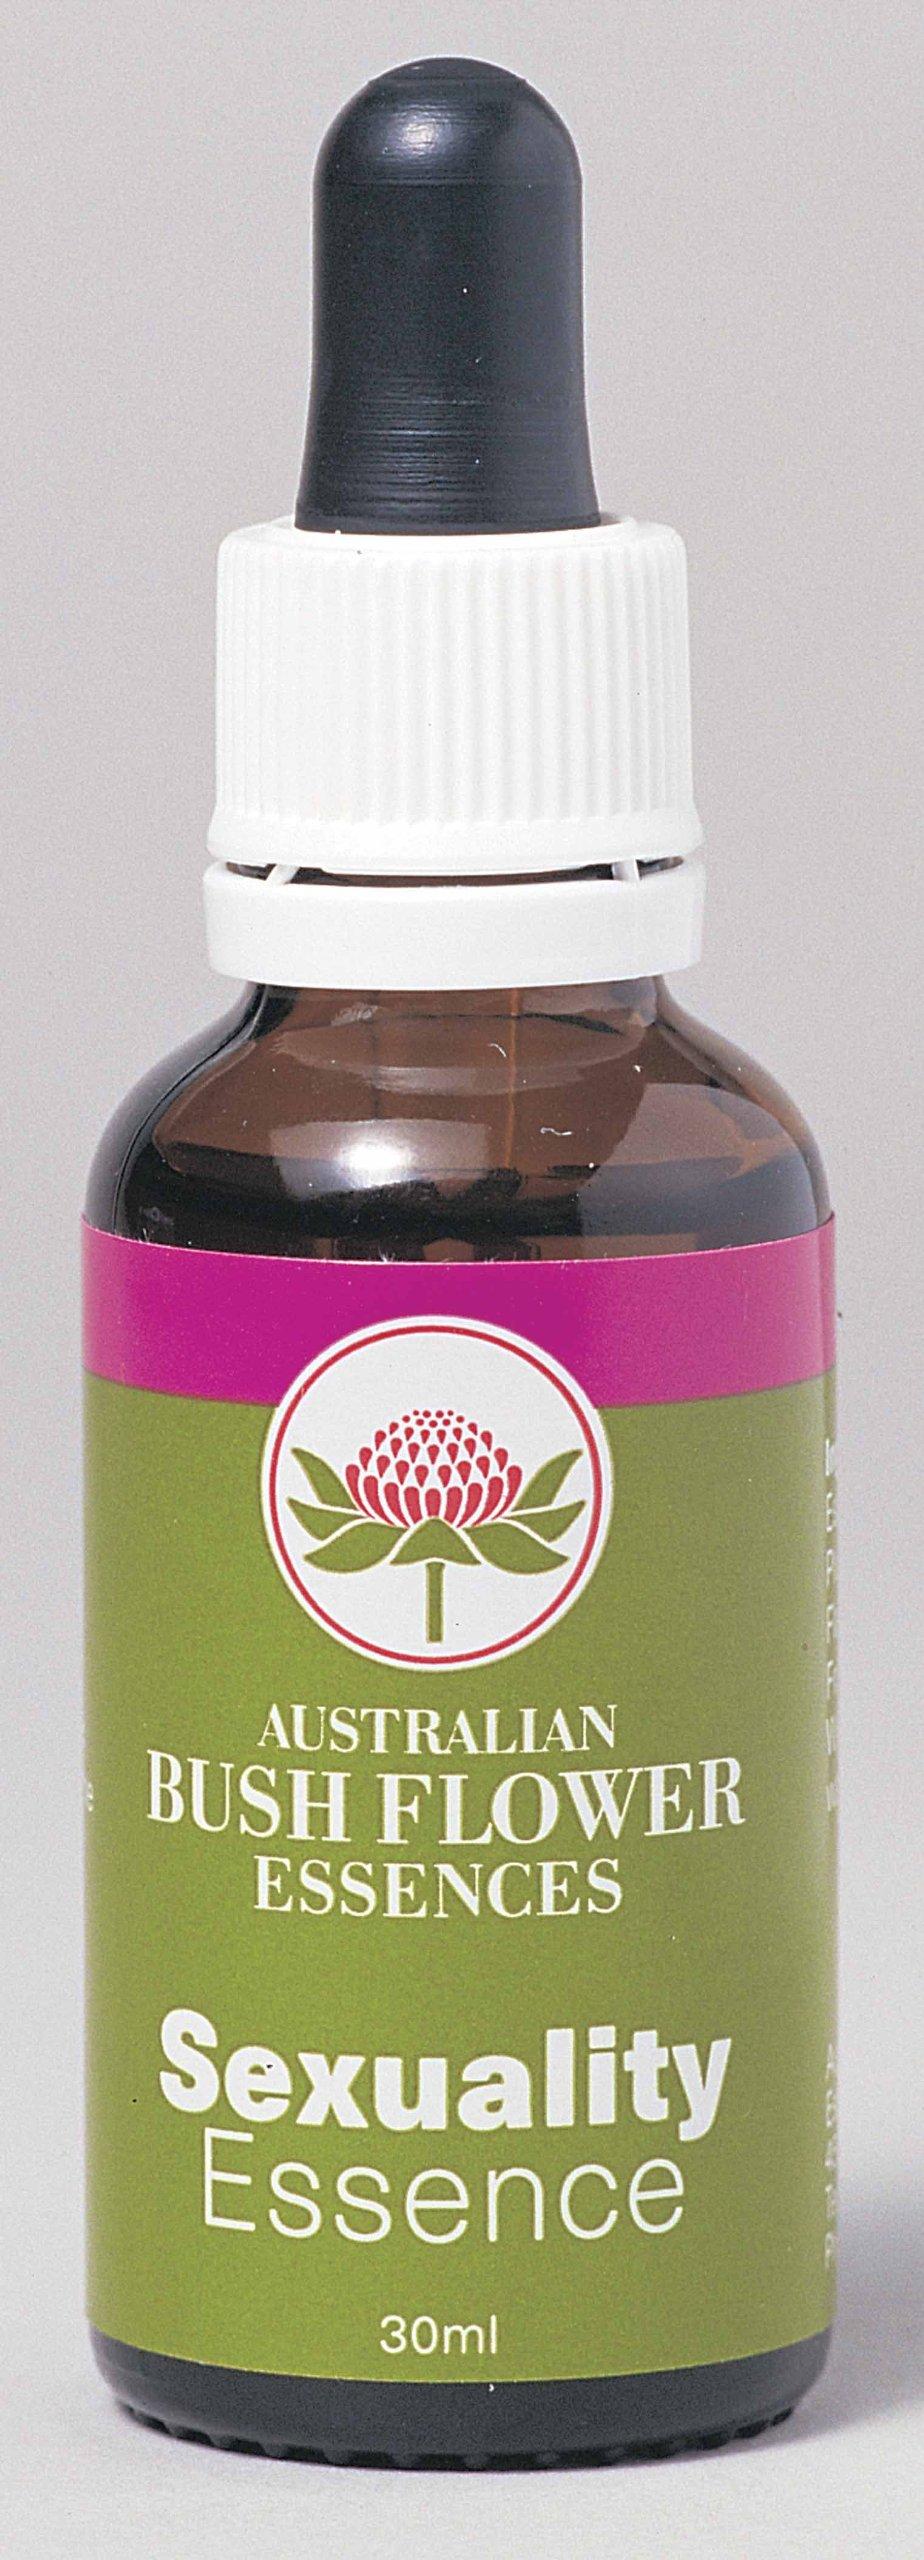 Australian Bushflower Essences Sexuality Drops 30mL by Australian Bush Flower Essences